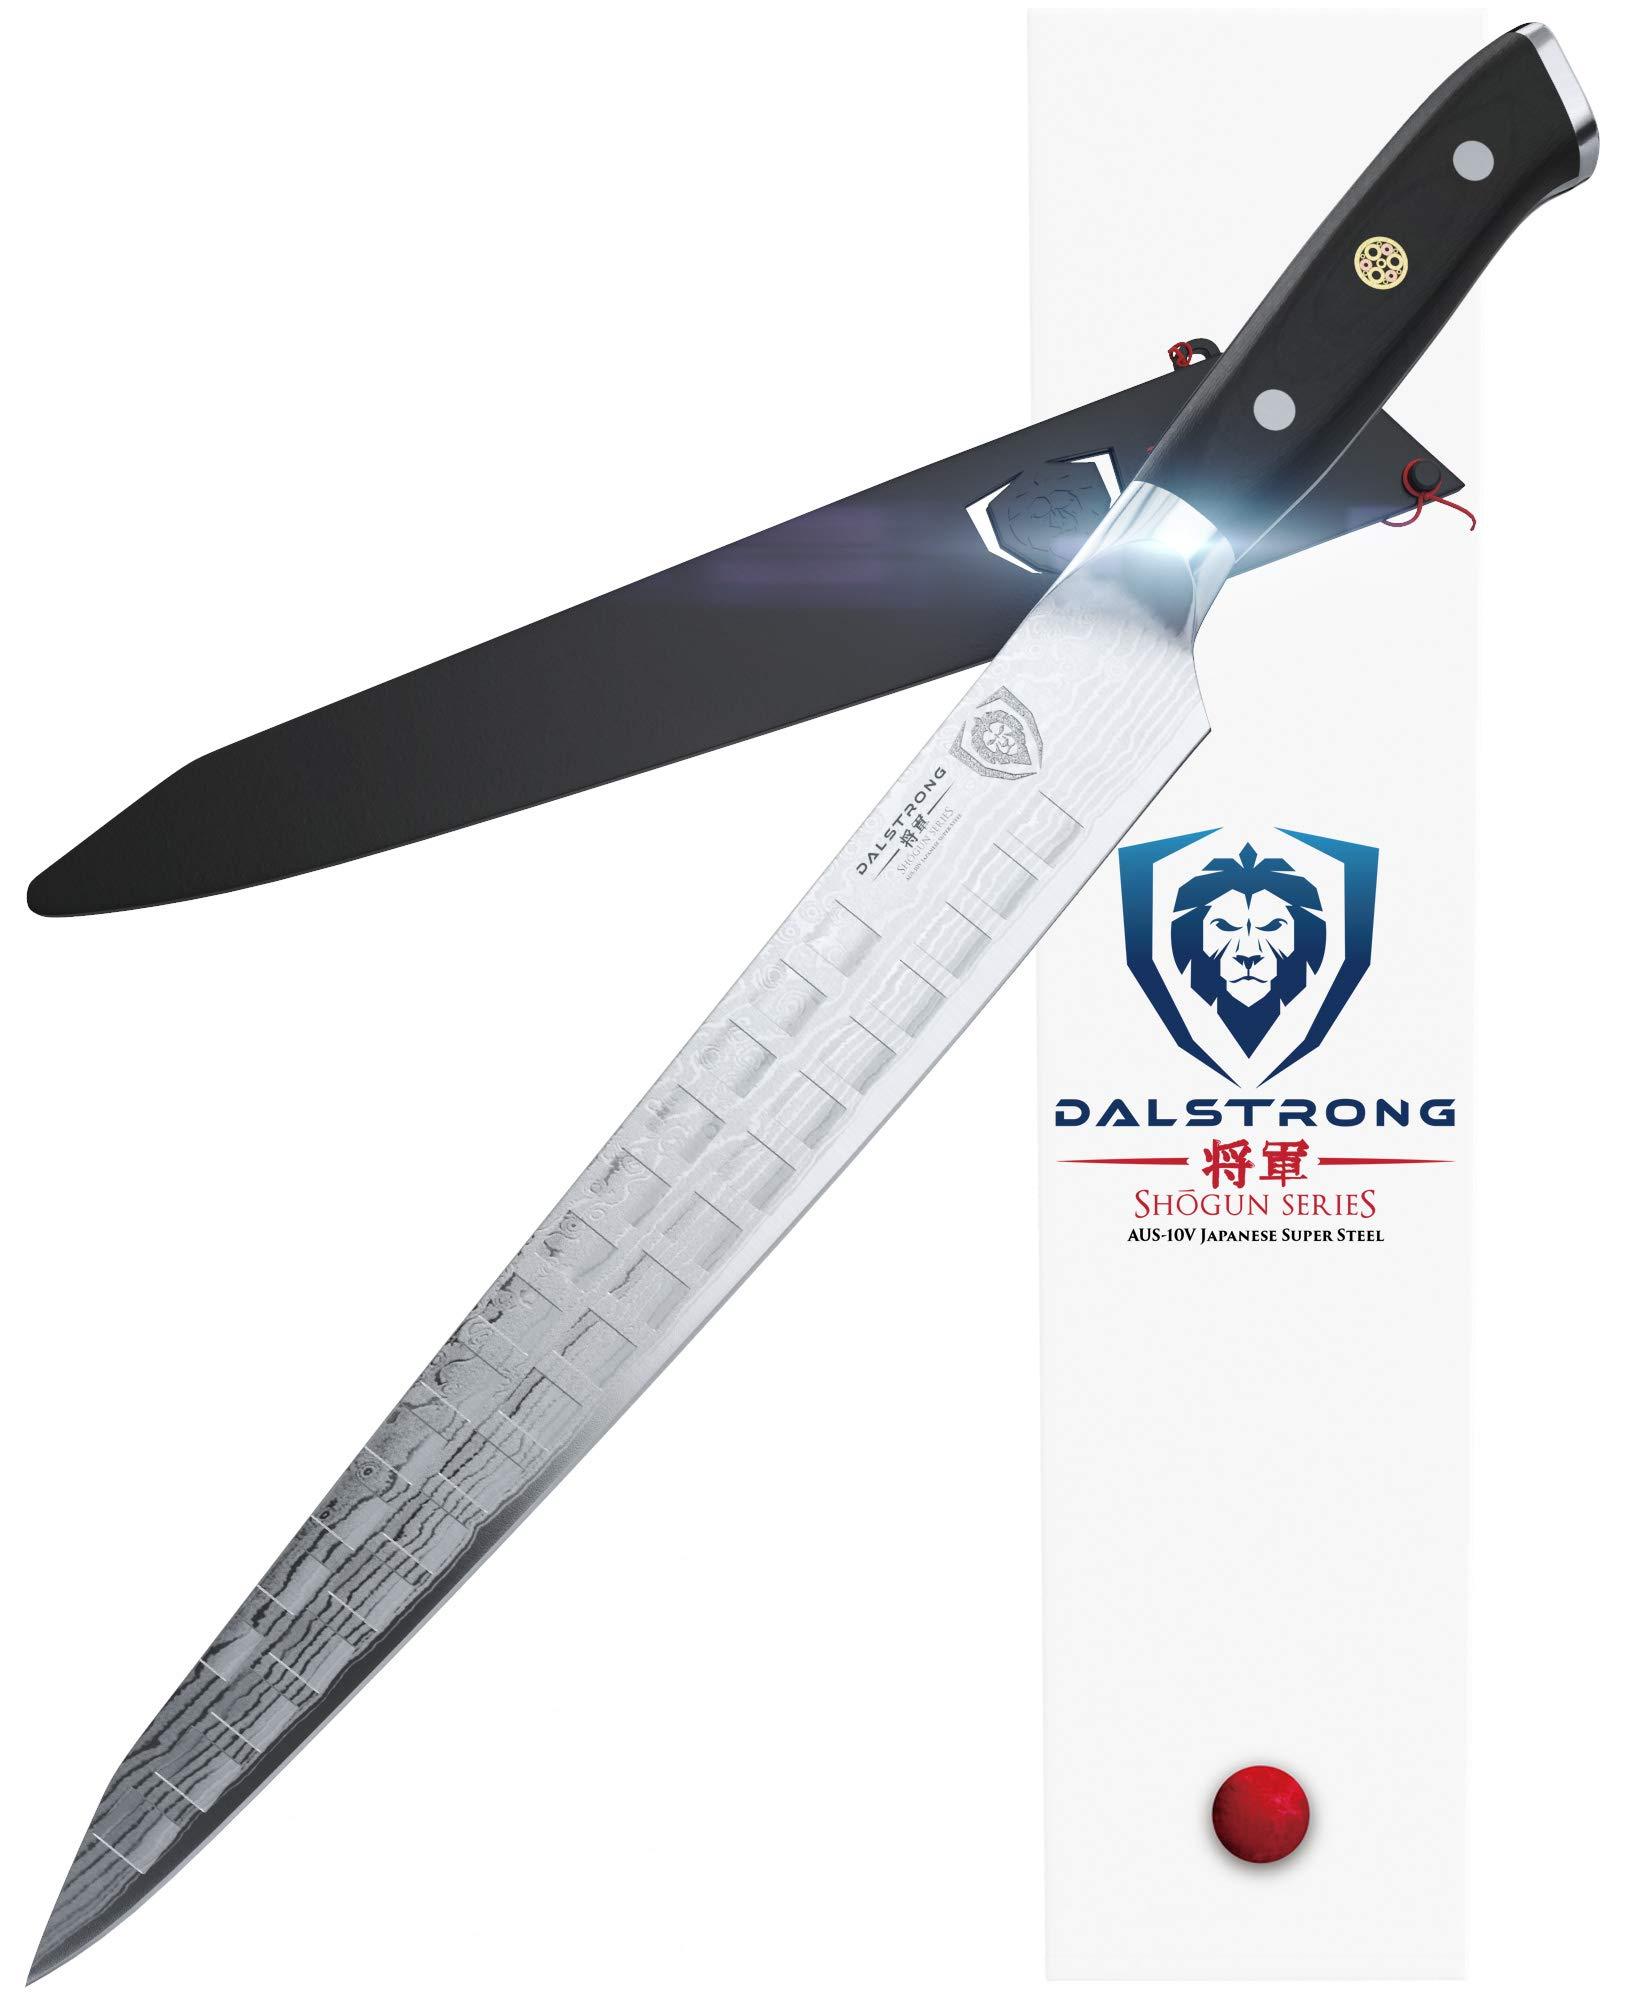 DALSTRONG Slicer Knife - 10.5'' Sujihiki - Shogun Series-Damascus - AUS-10V Japanese Super Steel - w/Sheath - Meats - Fish - Sushi